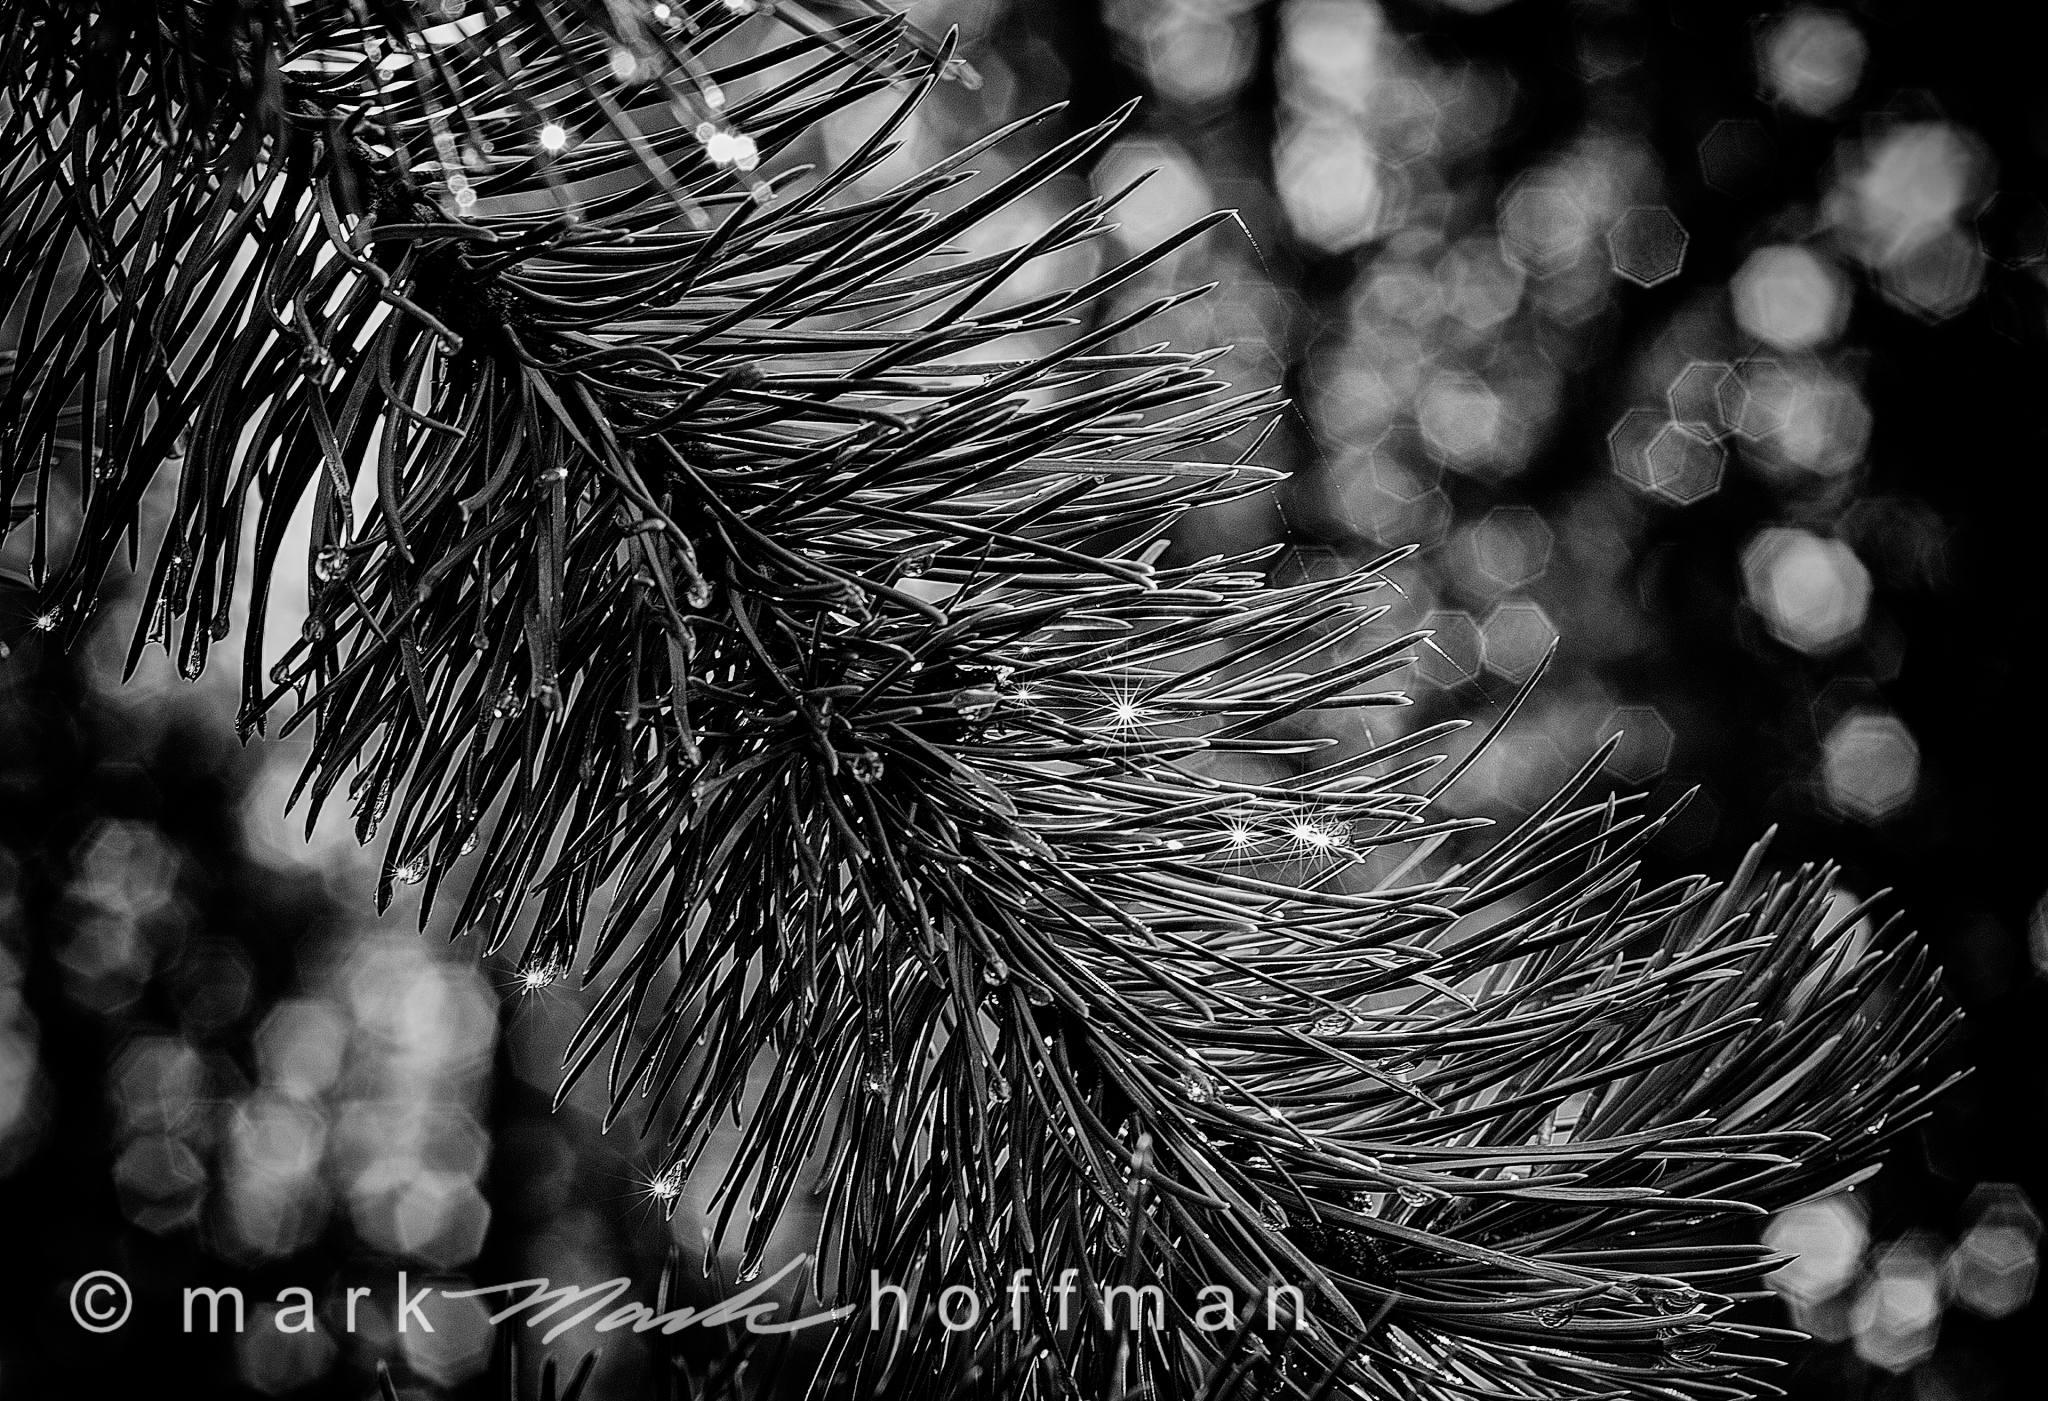 Mark_Hoffman_photophart_20150804_0154_Psiz_Silv.jpg